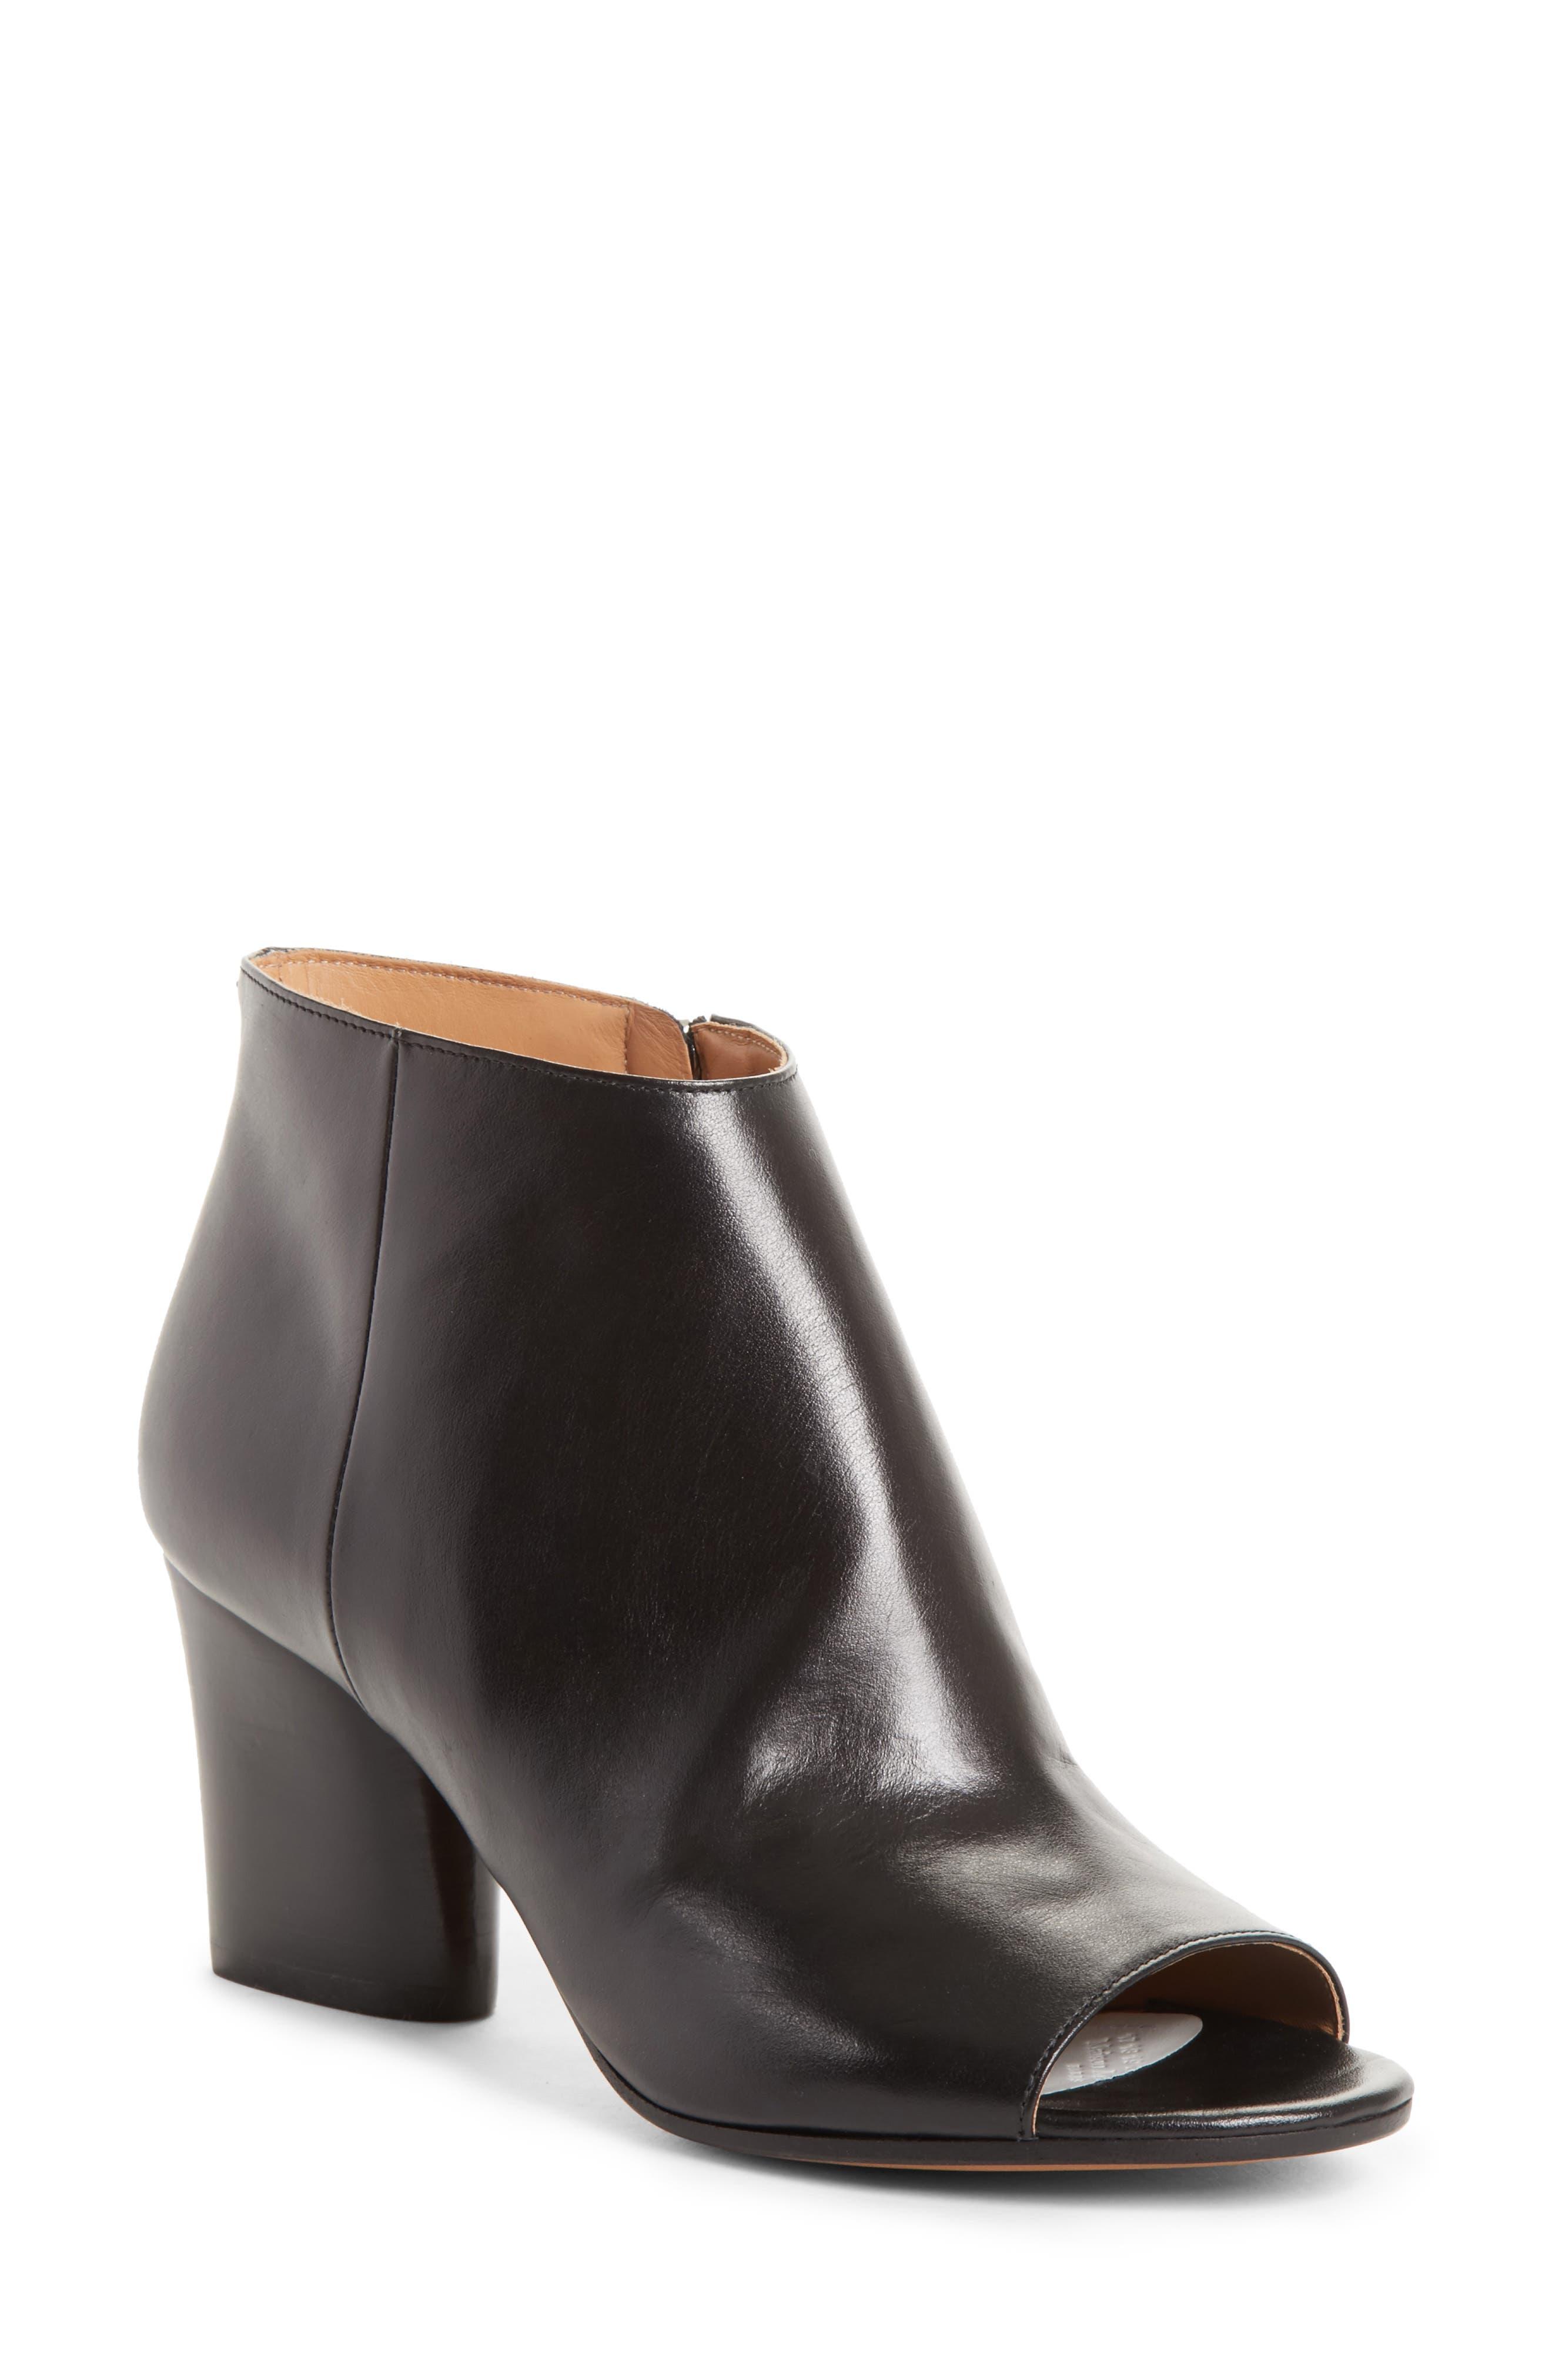 Alternate Image 1 Selected - Maison Margiela Open Toe Ankle Boot (Women)